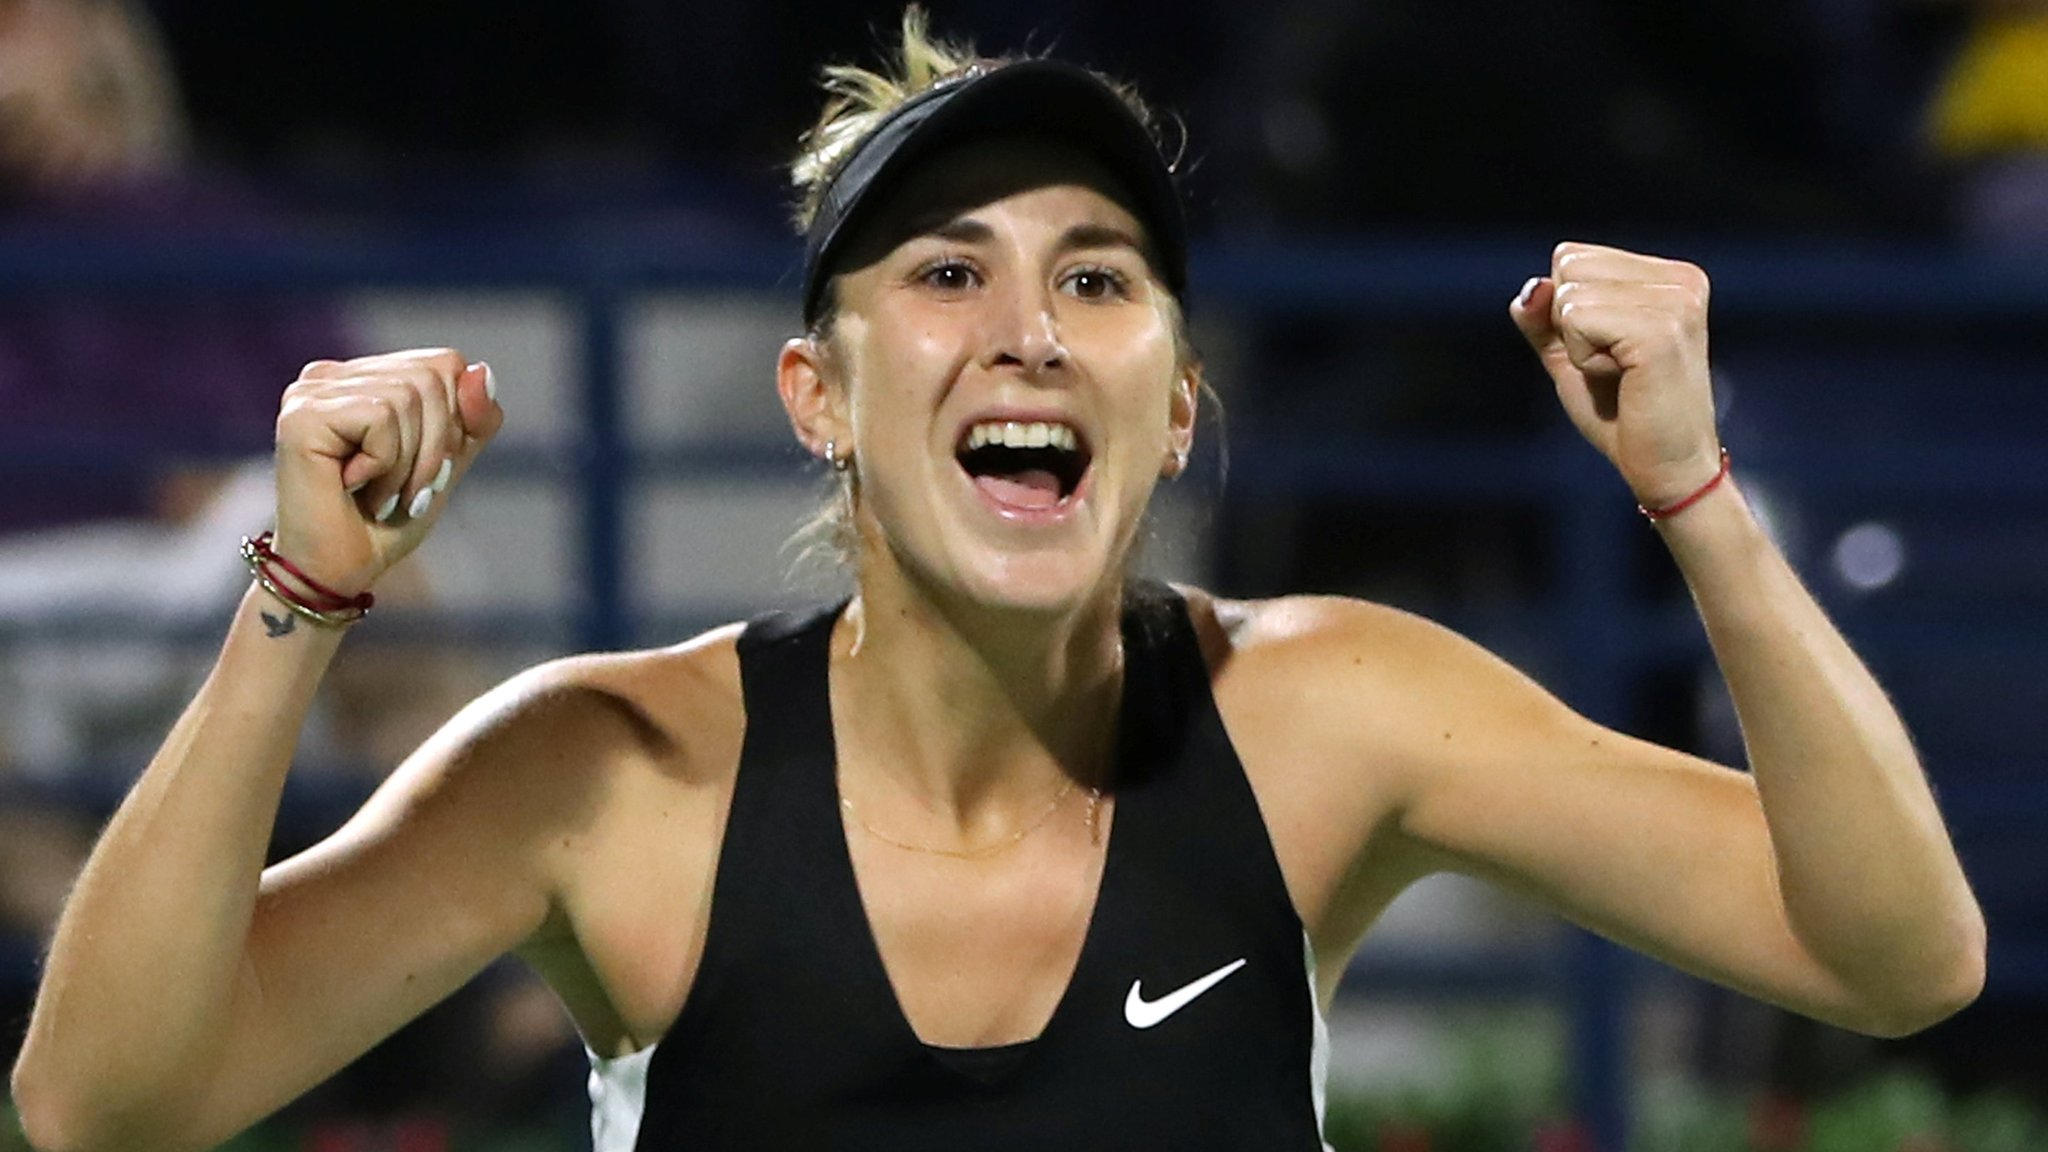 Dubai Tennis Championships: Belinda Bencic beats Petra Kvitova in final